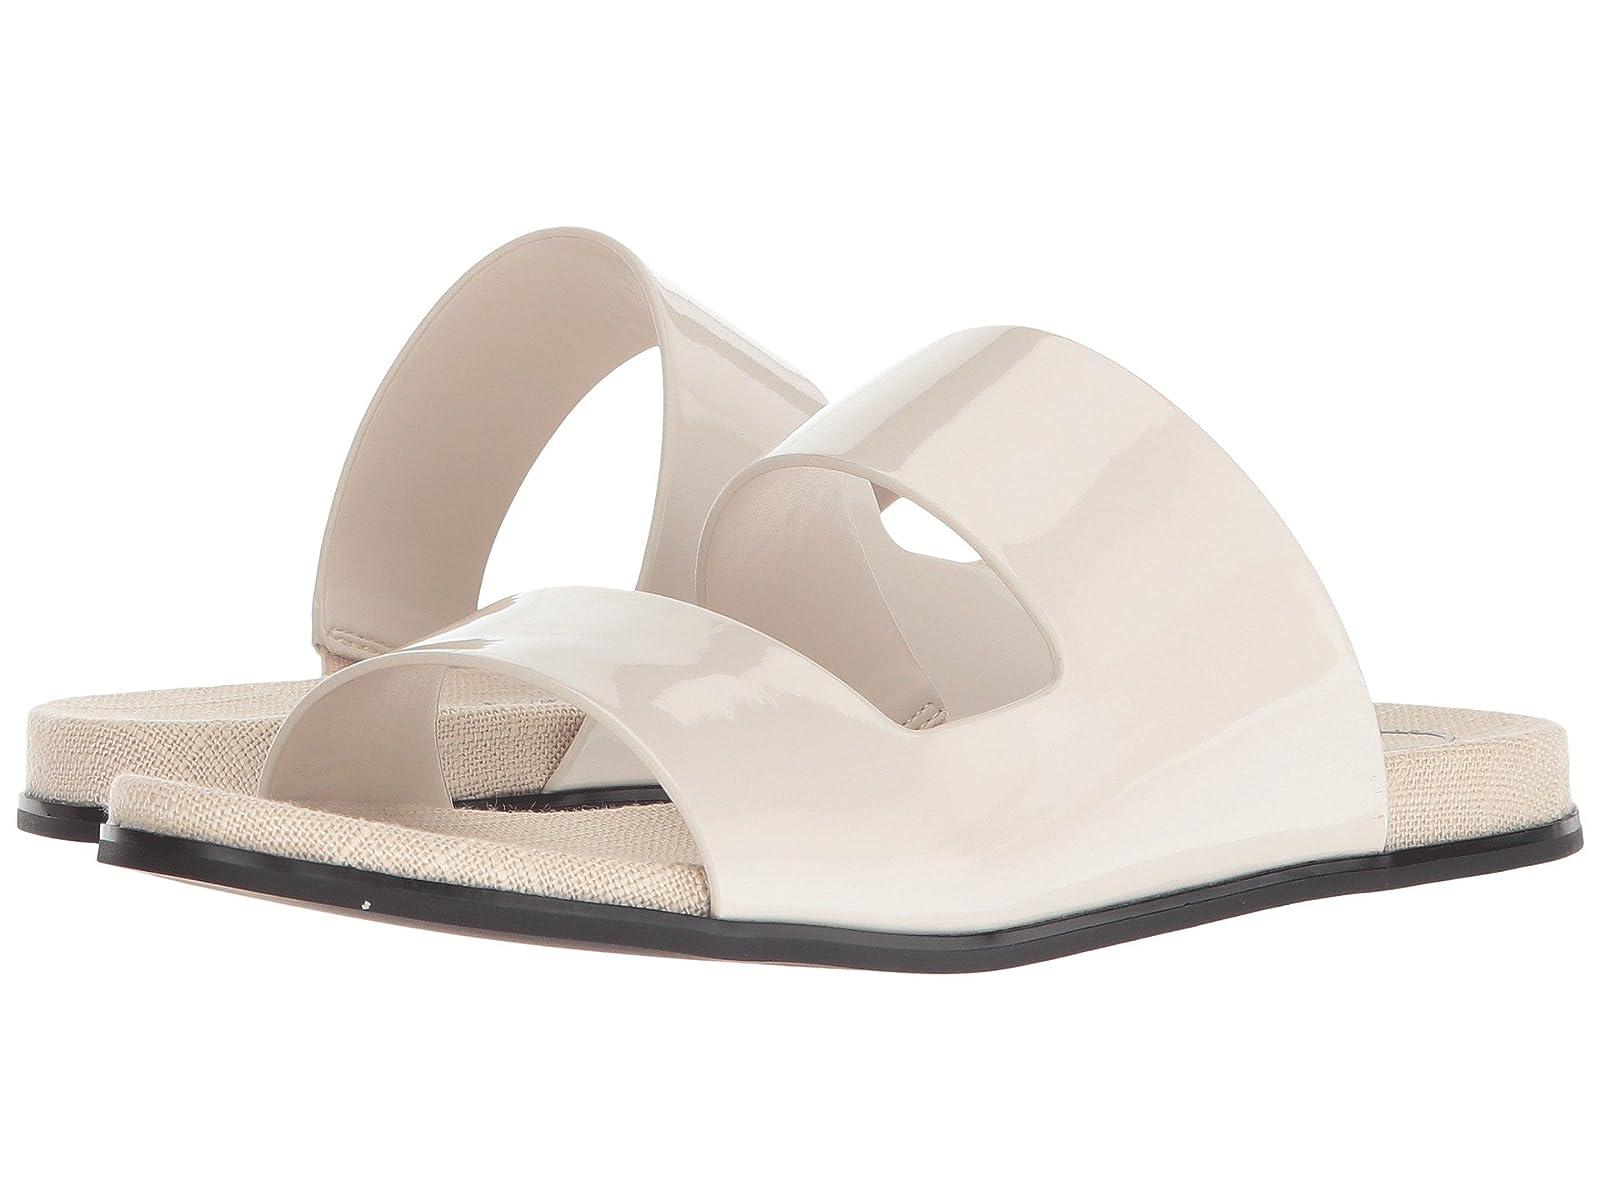 Calvin Klein Posey SlideCheap and distinctive eye-catching shoes